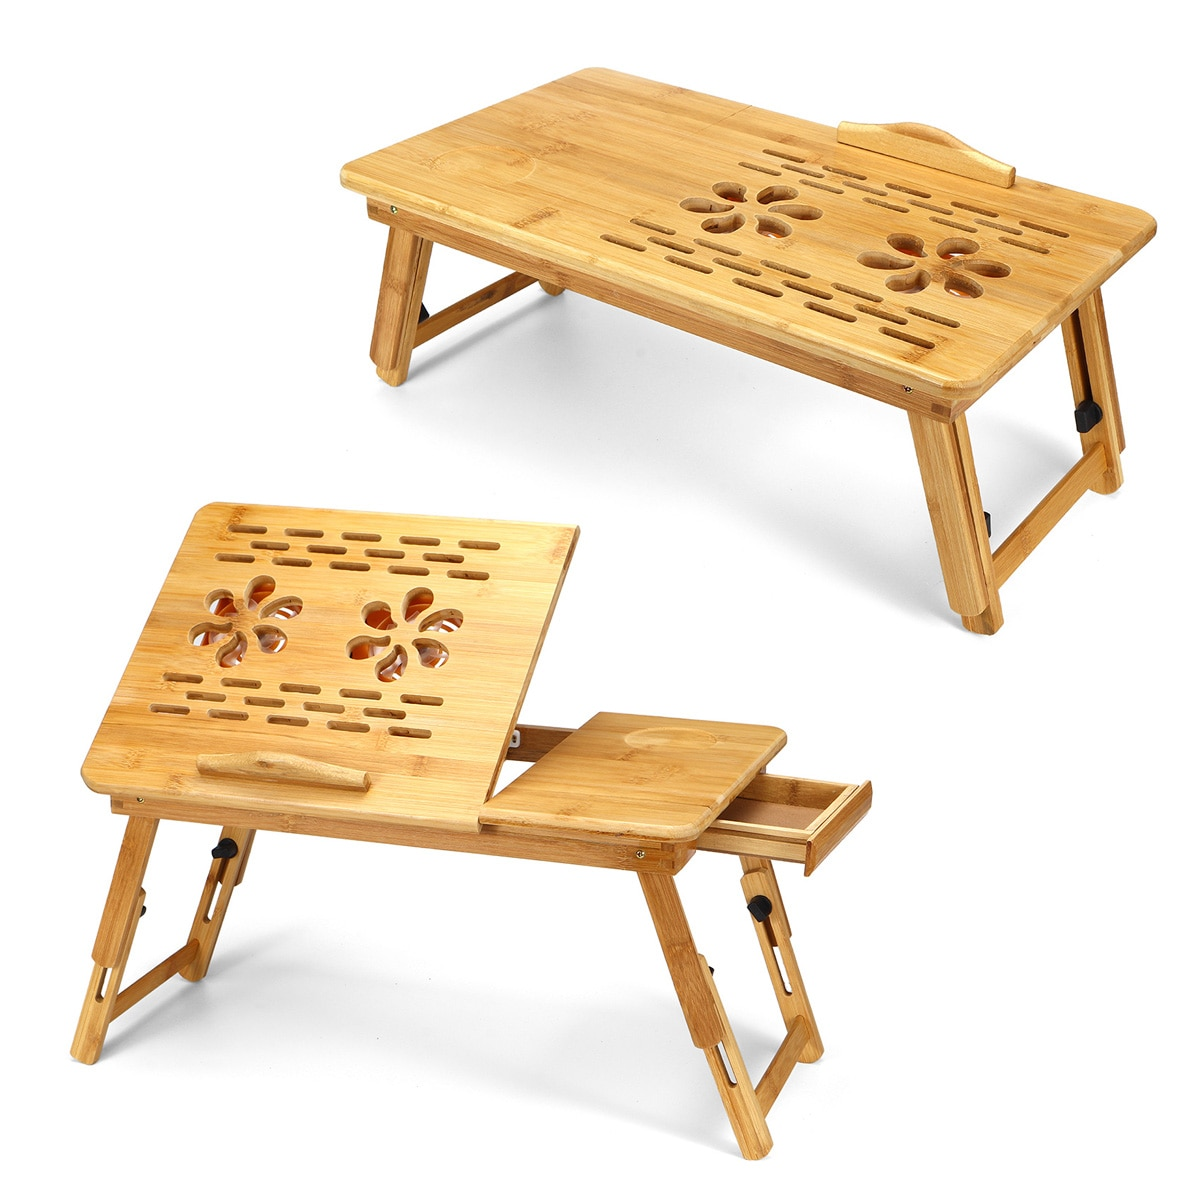 Mesa plegable portátil de bambú para ordenador portátil, sofá cama, escritorio con ventilador de refrigeración, mesa de cama para libros de ordenador portátil